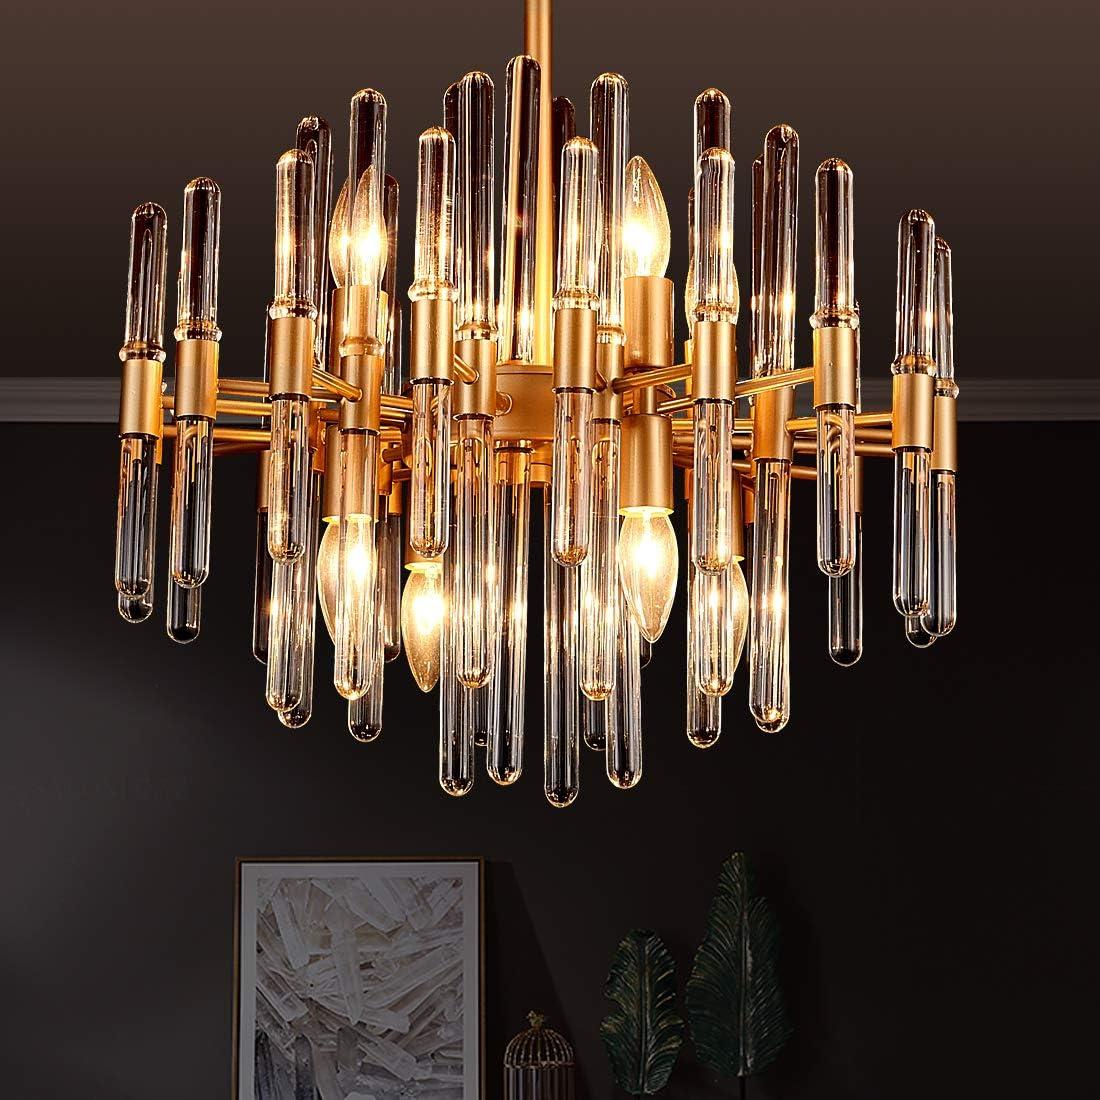 TZOE Modern Chandeliers,Crystal Chandelier,8 Light Round Pendant  Light,Width 19 inch,Brass Metal + Clear Glass,Adjustable Height,UL Listed -  - Amazon.com